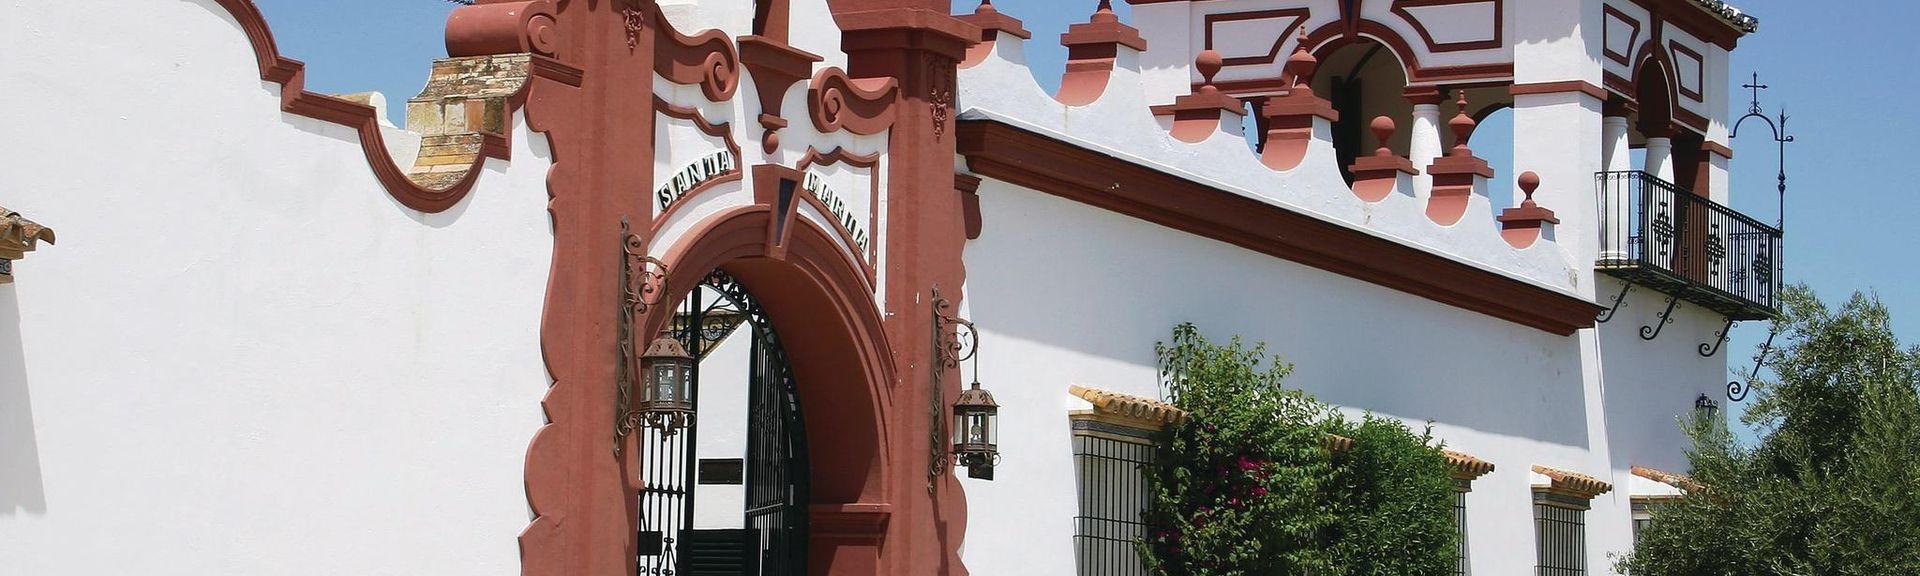 Zufre, Andalusië, Spanje